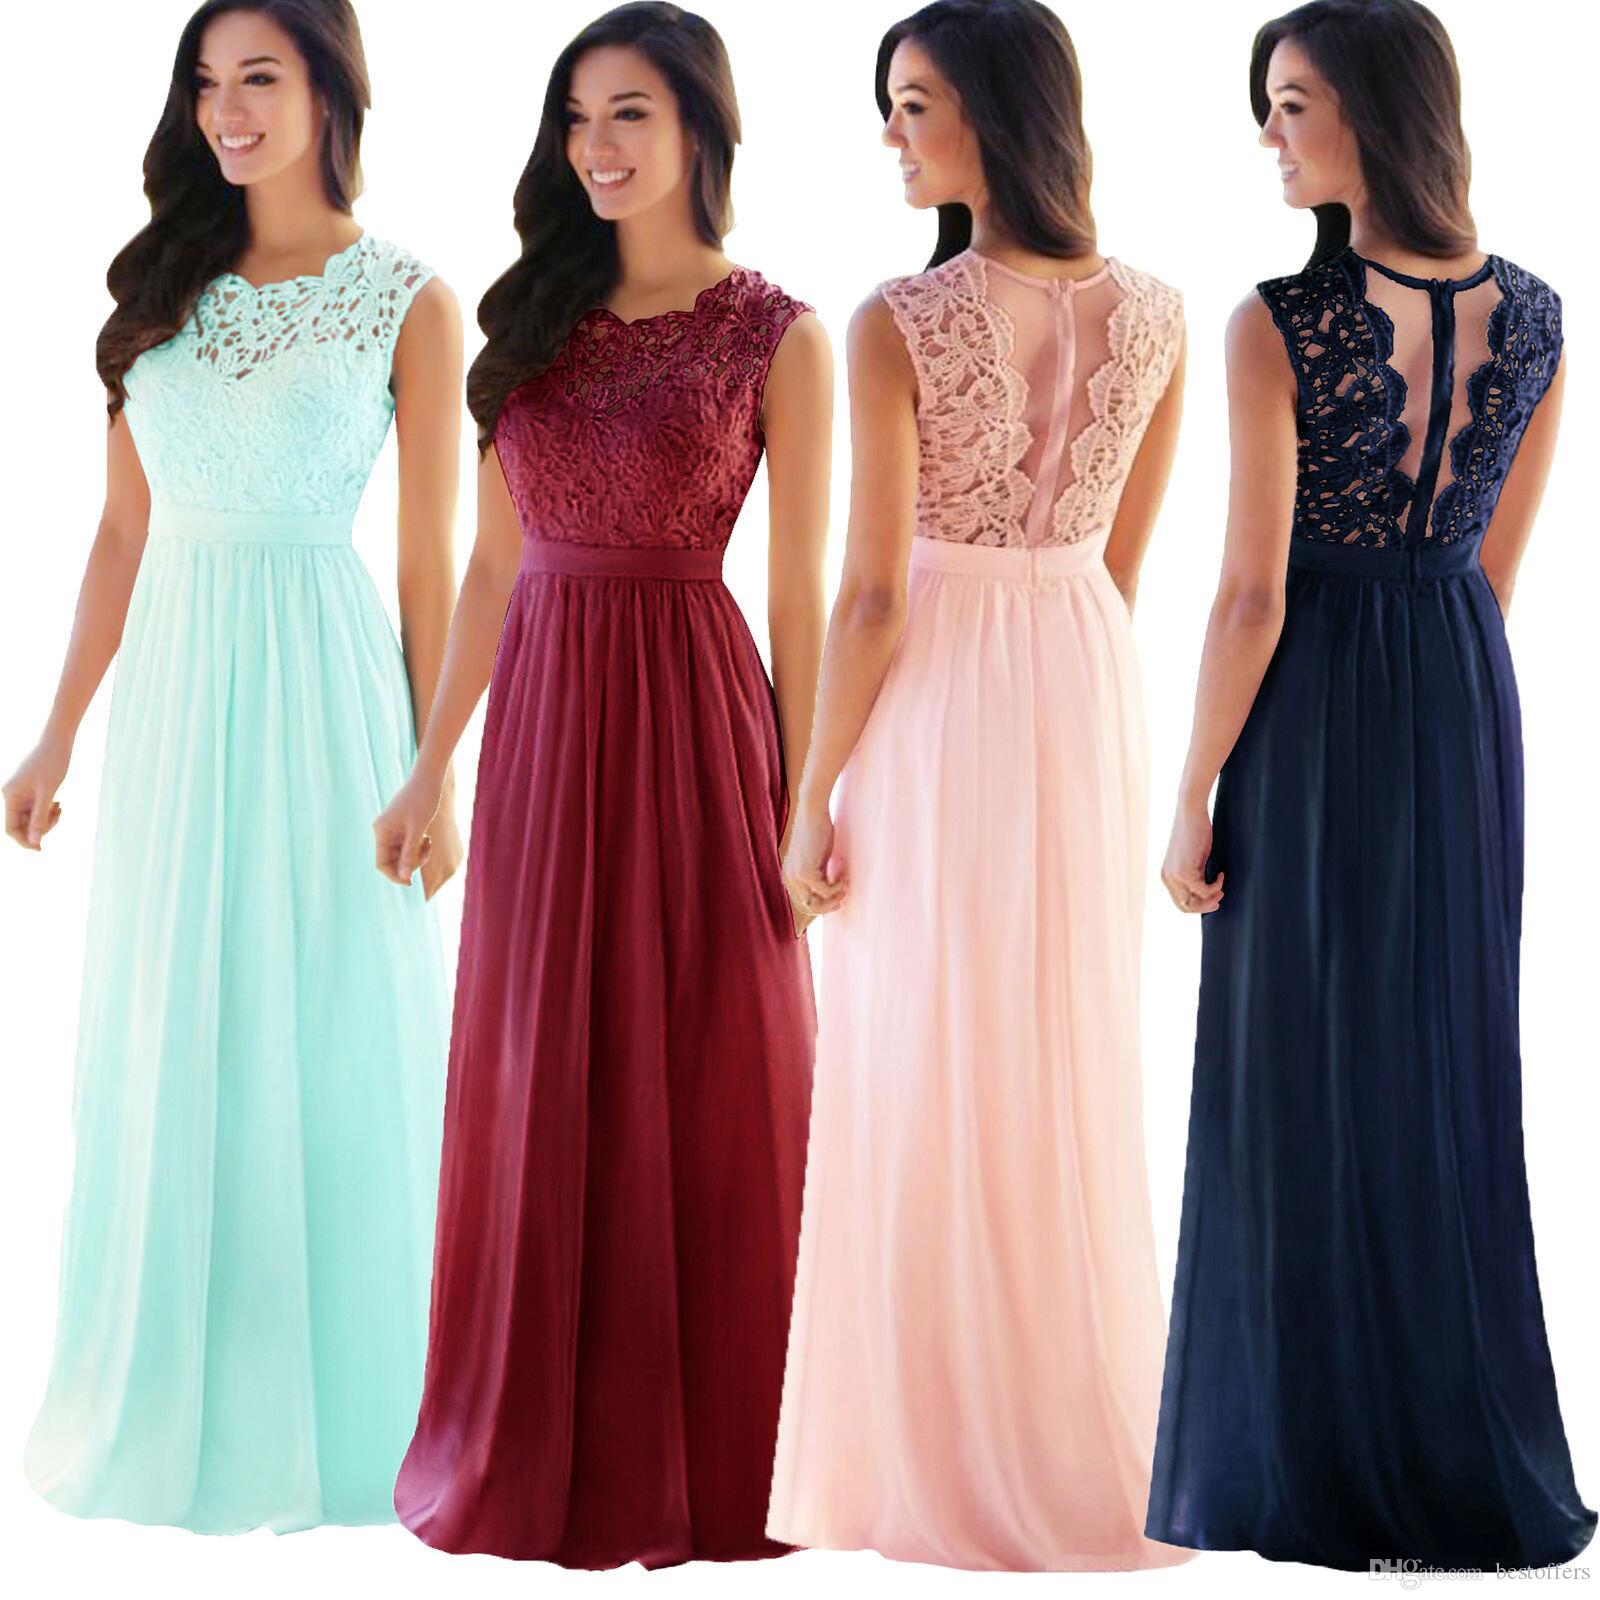 524ec39f6 Compre Vestidos De Dama De Honor Elegantes Baratos Blush Pink Mint Lace  Country Style 2018 Nuevos Vestidos De Dama De Honor A Line Vestidos Largos  De ...